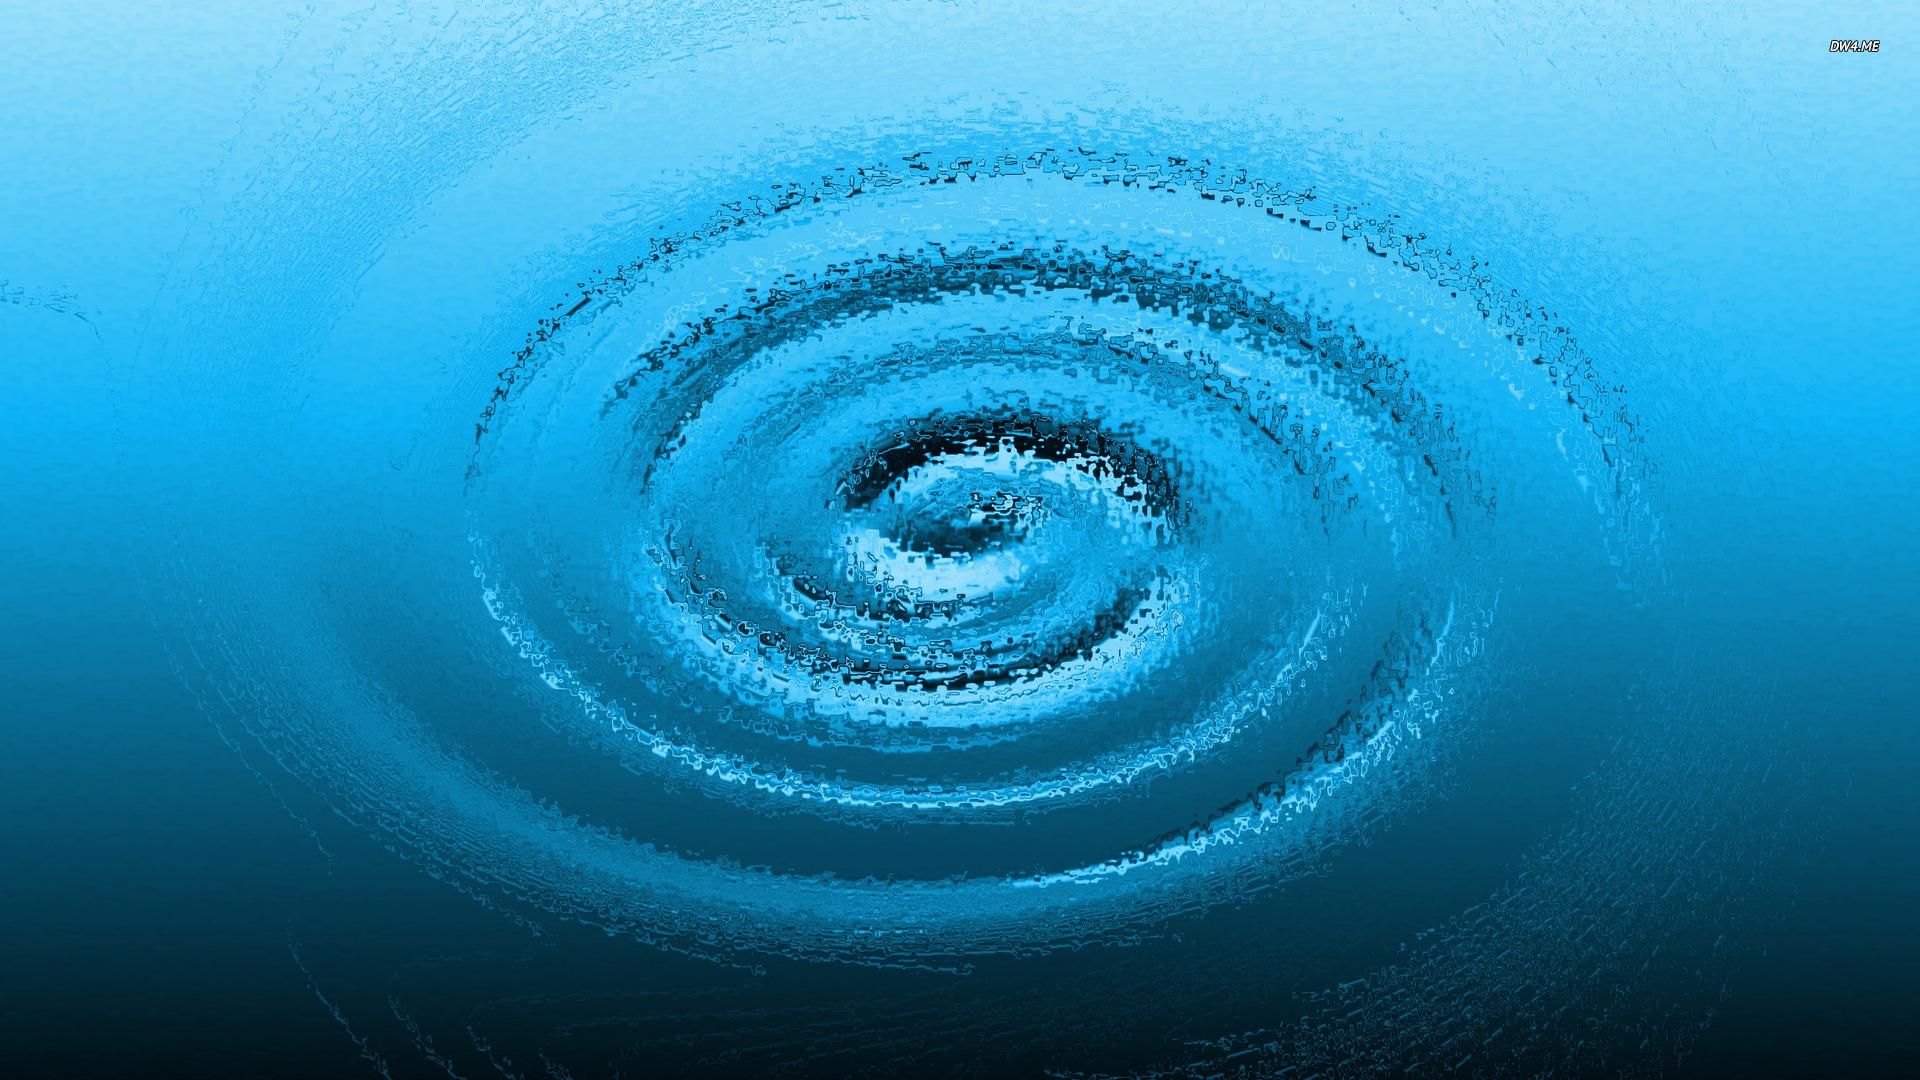 Water vortex wallpaper   Abstract wallpapers   503 1920x1080